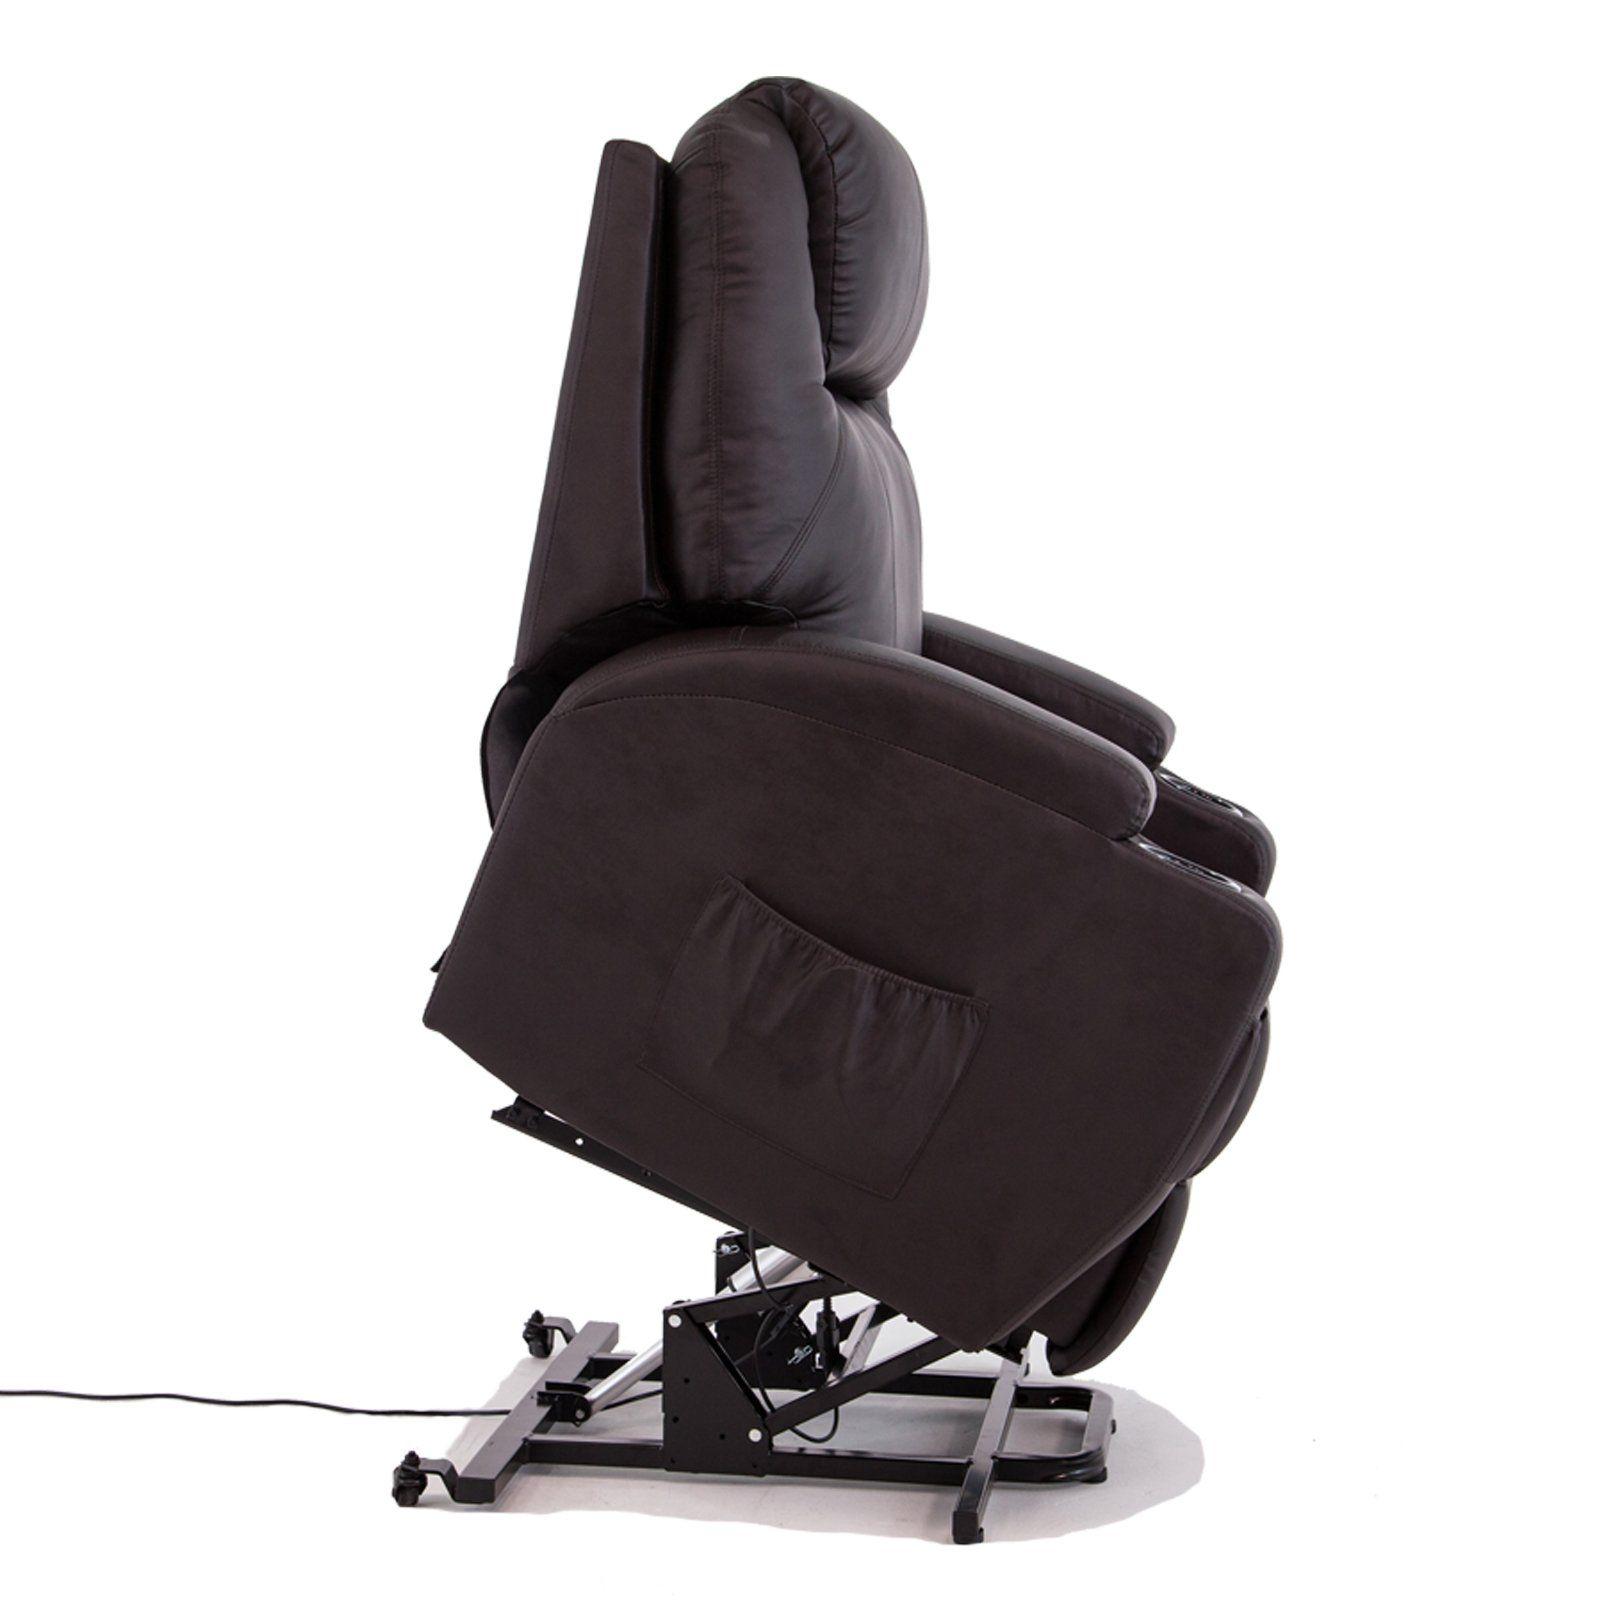 Pleasant Mecor Lift Chair For Elderly Power Lift Recliner Living Room Gamerscity Chair Design For Home Gamerscityorg